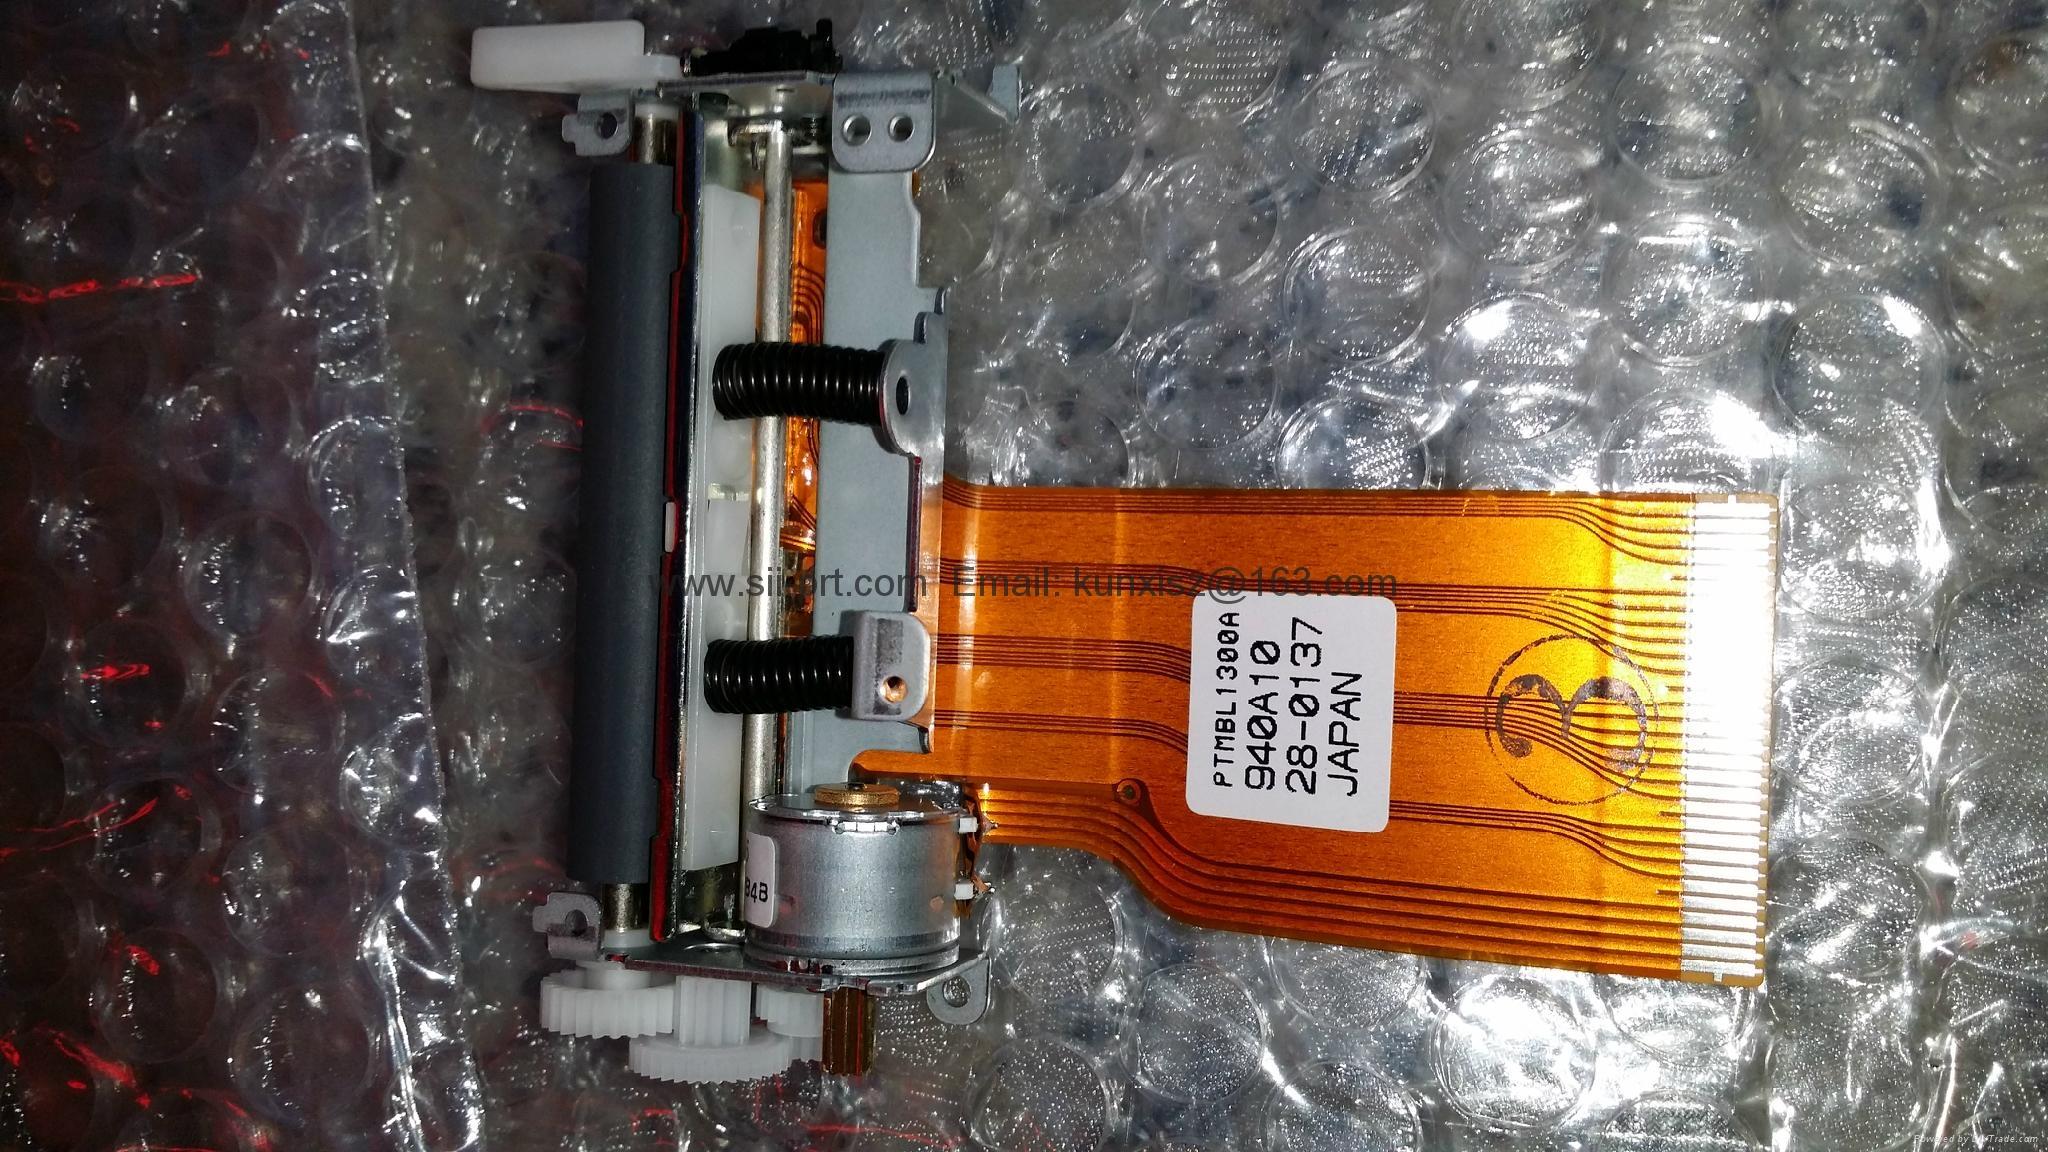 MBL1317A thermal printer 2